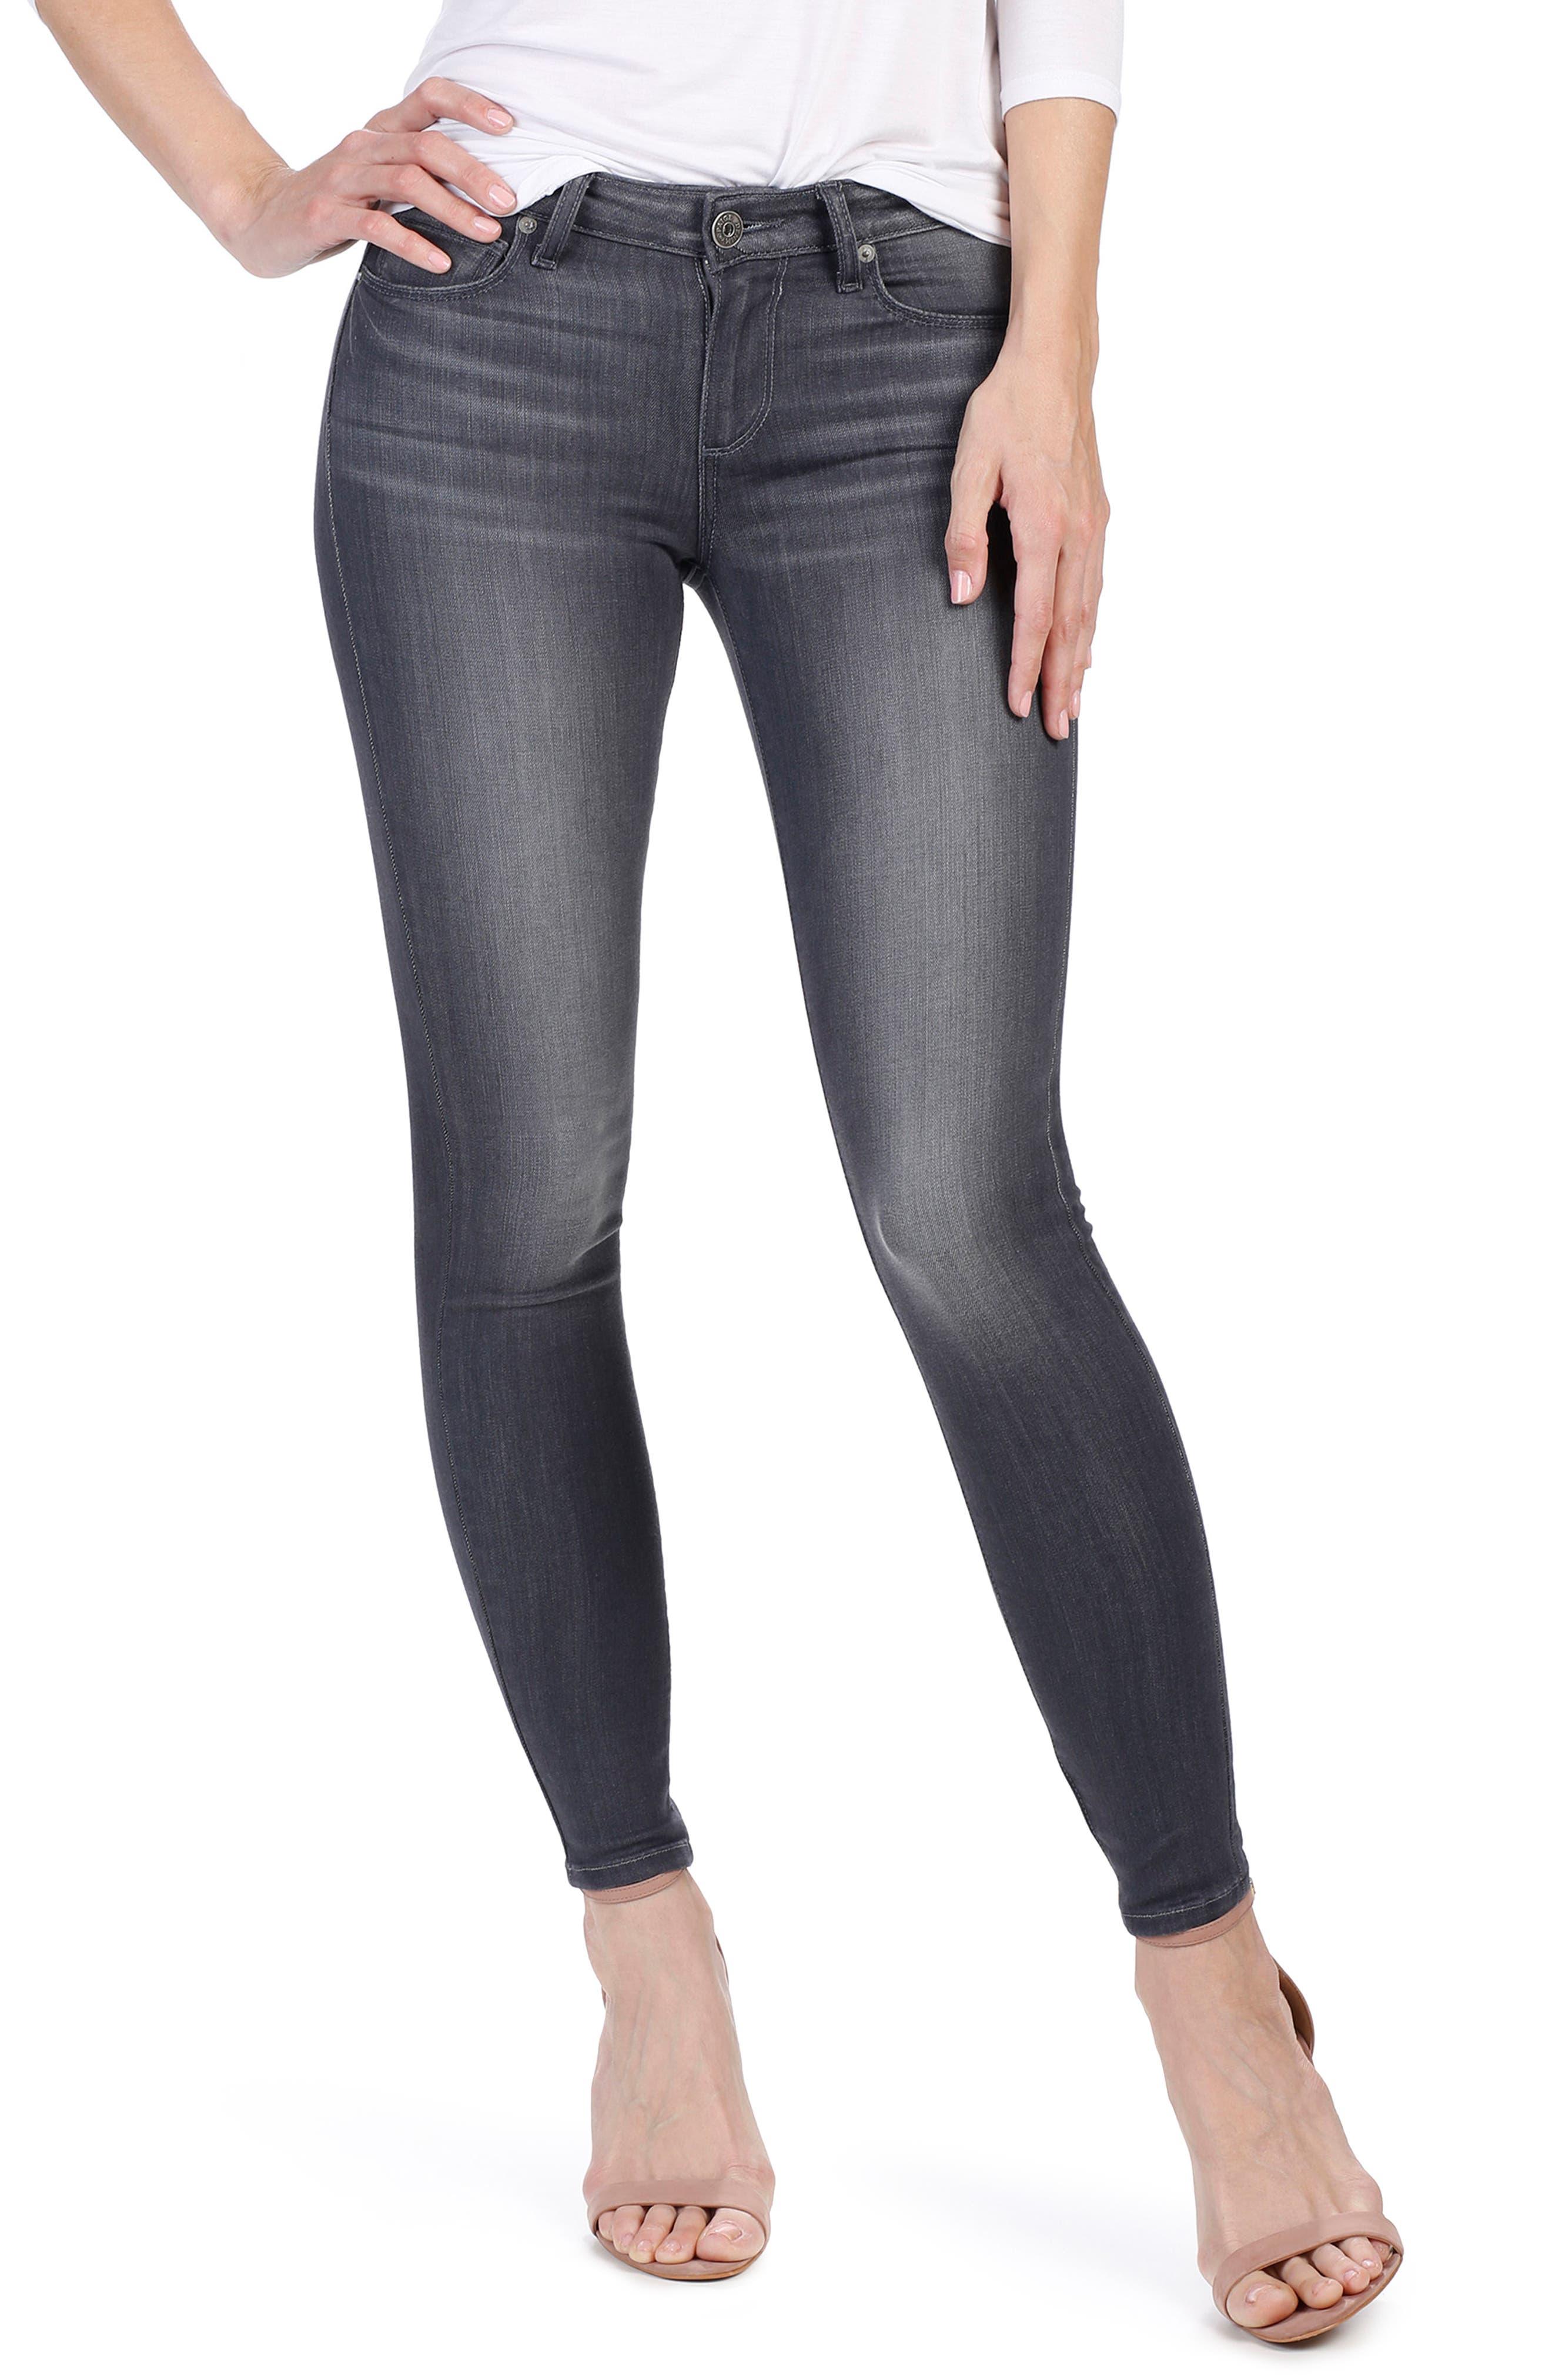 Transcend - Verdugo Ankle Skinny Jeans,                         Main,                         color, 020